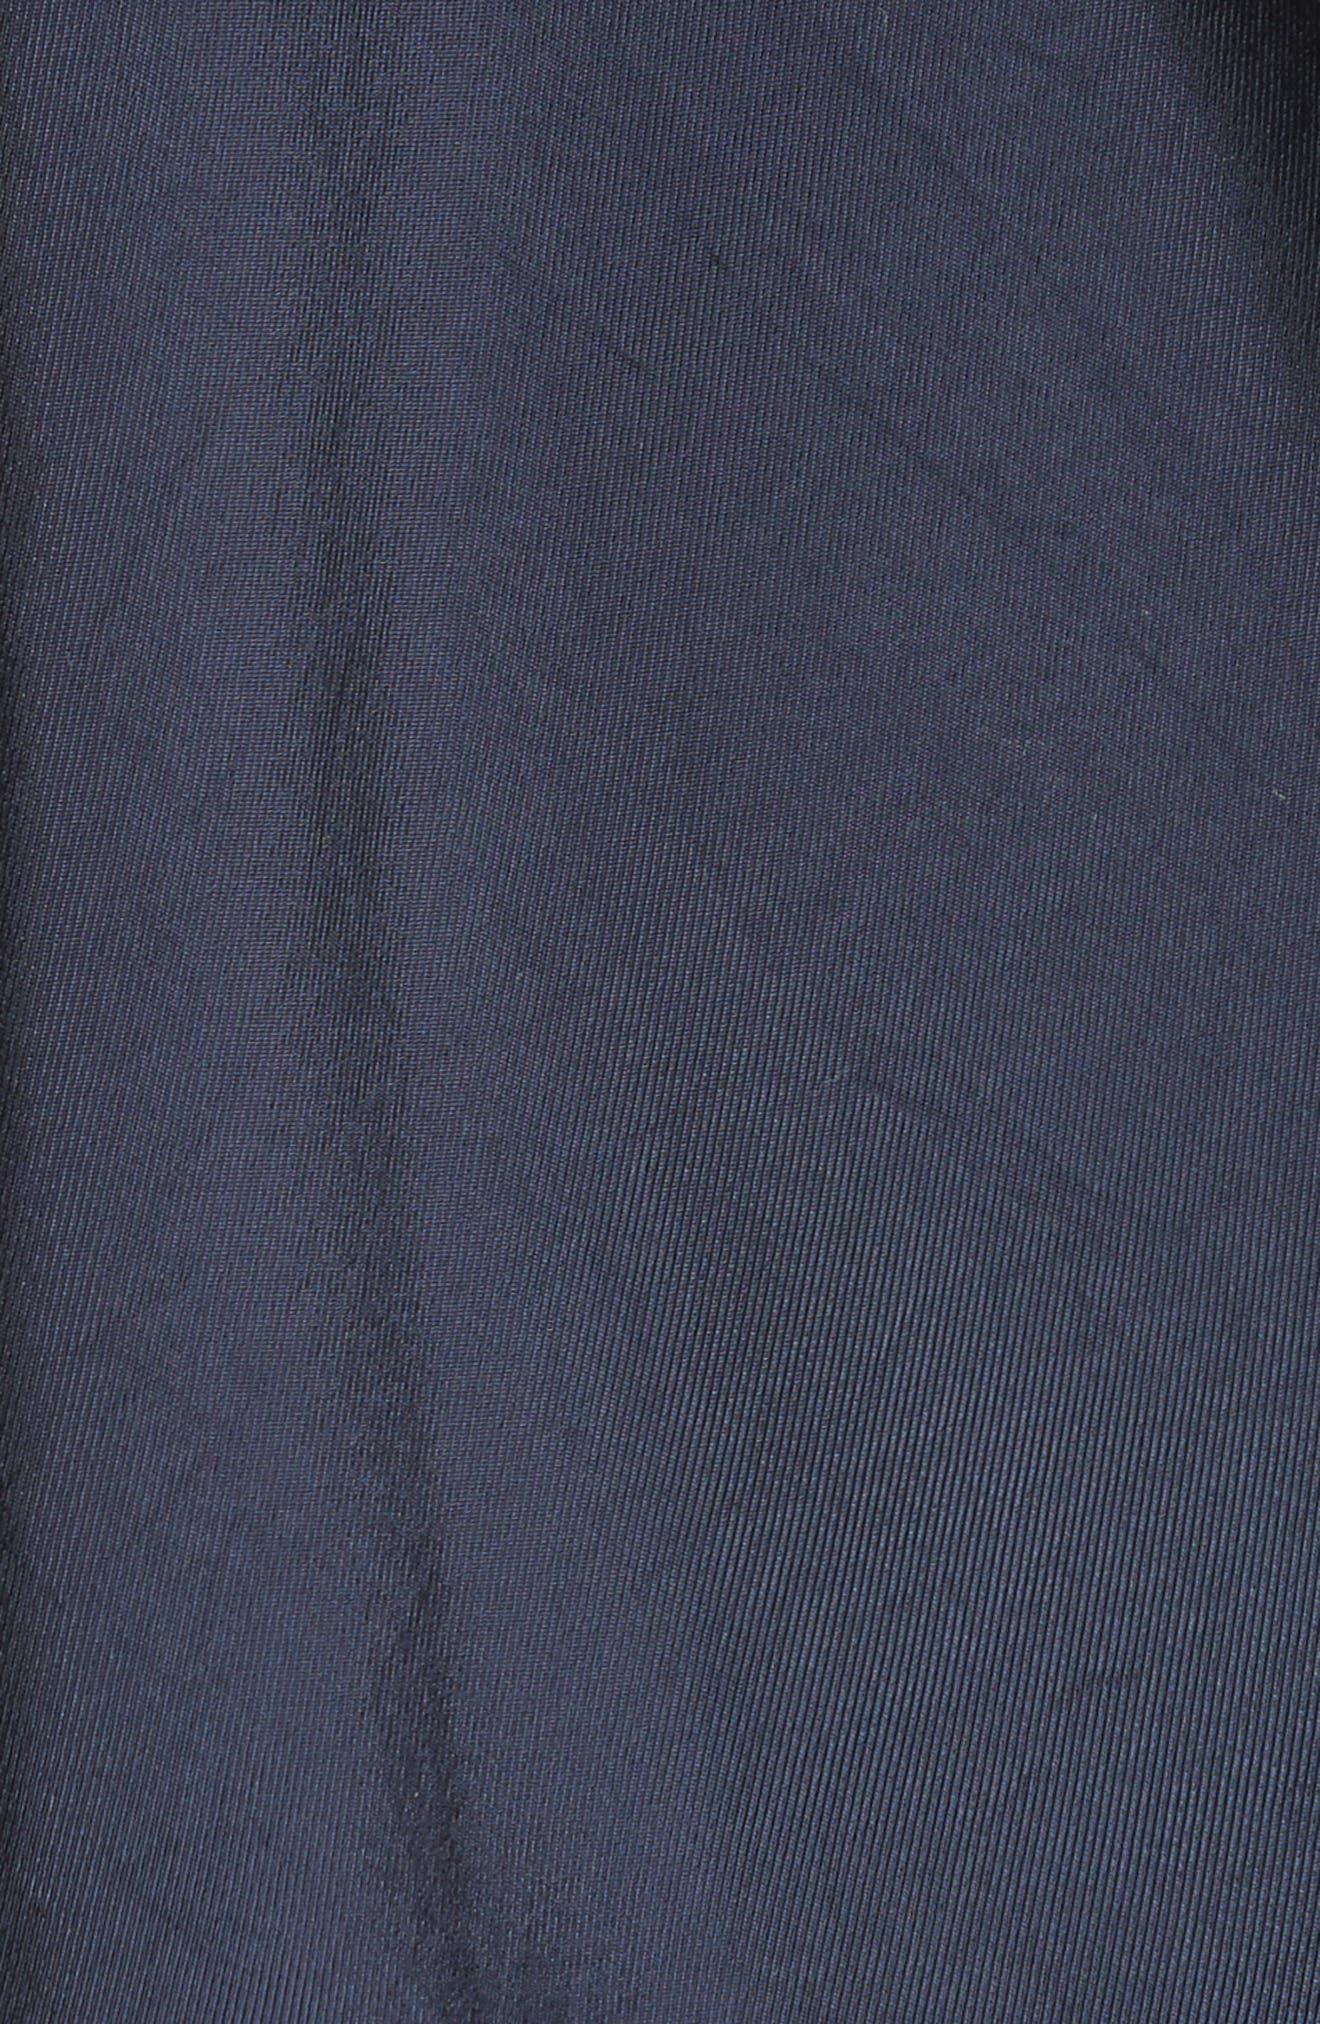 Mendini Strappy Back Silk Camisole,                             Alternate thumbnail 5, color,                             402